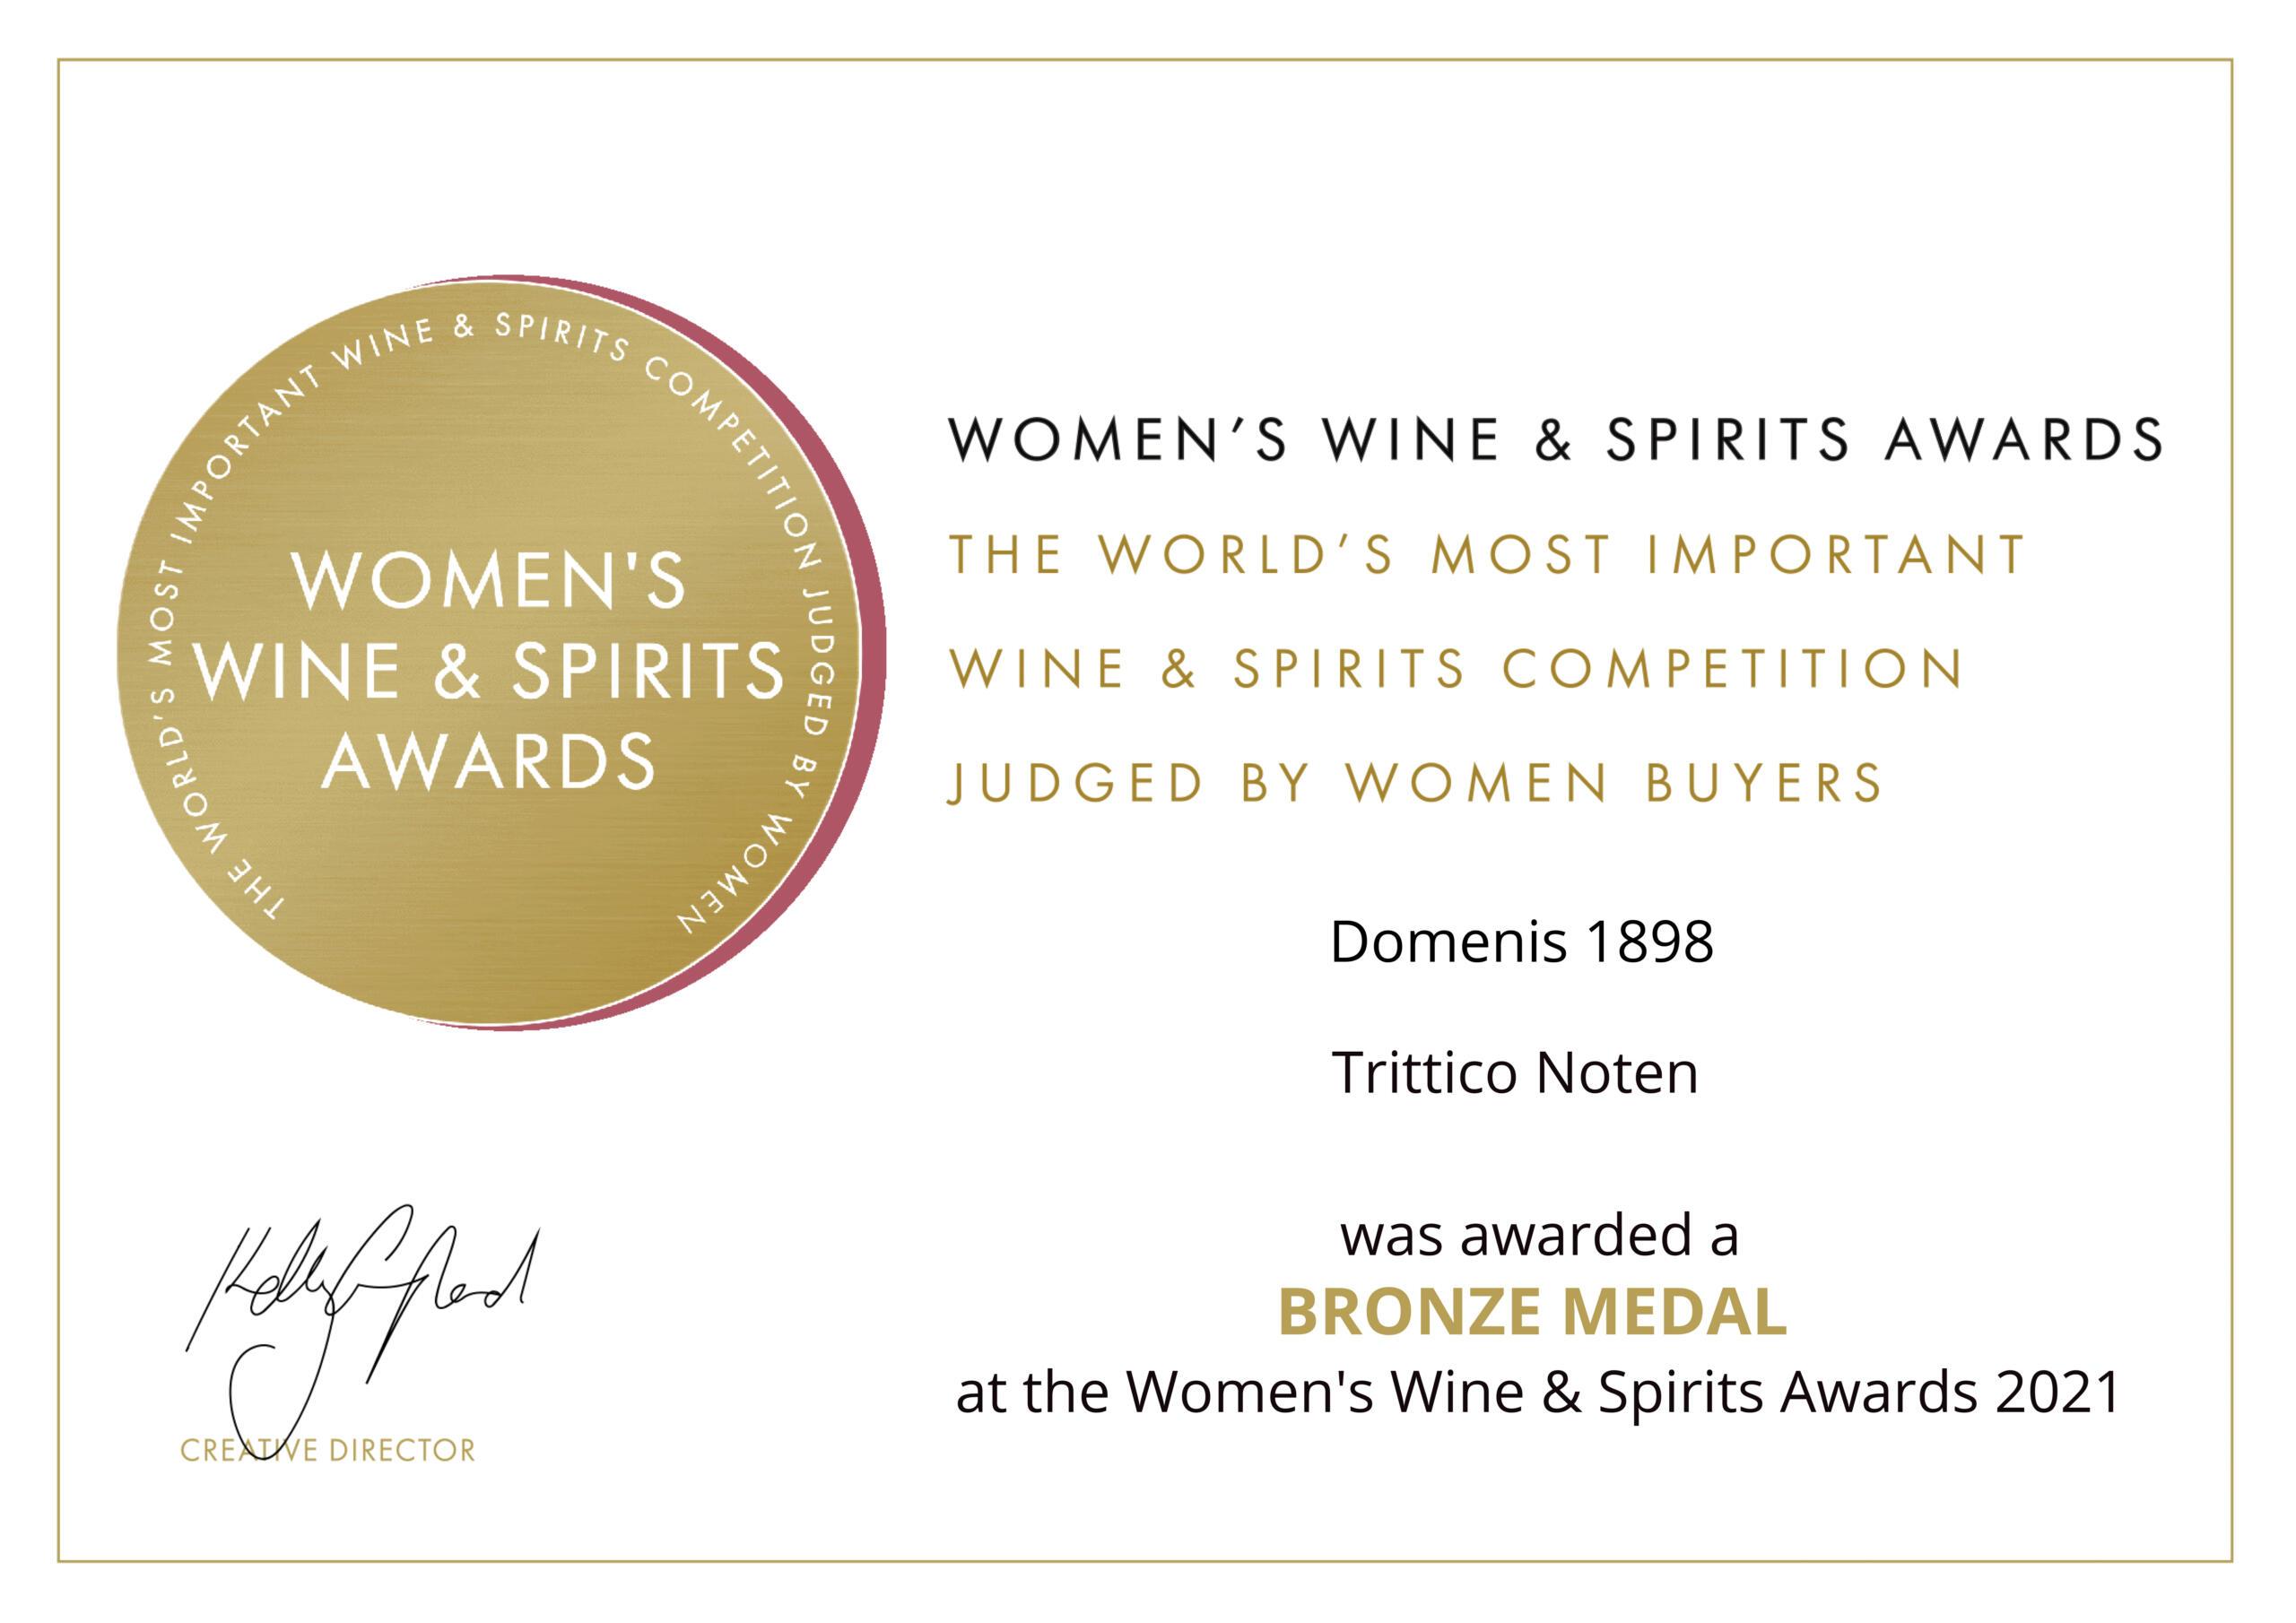 Women's Wine & Spirit Awards 2021 – Bronze Medal – Trittico Noten